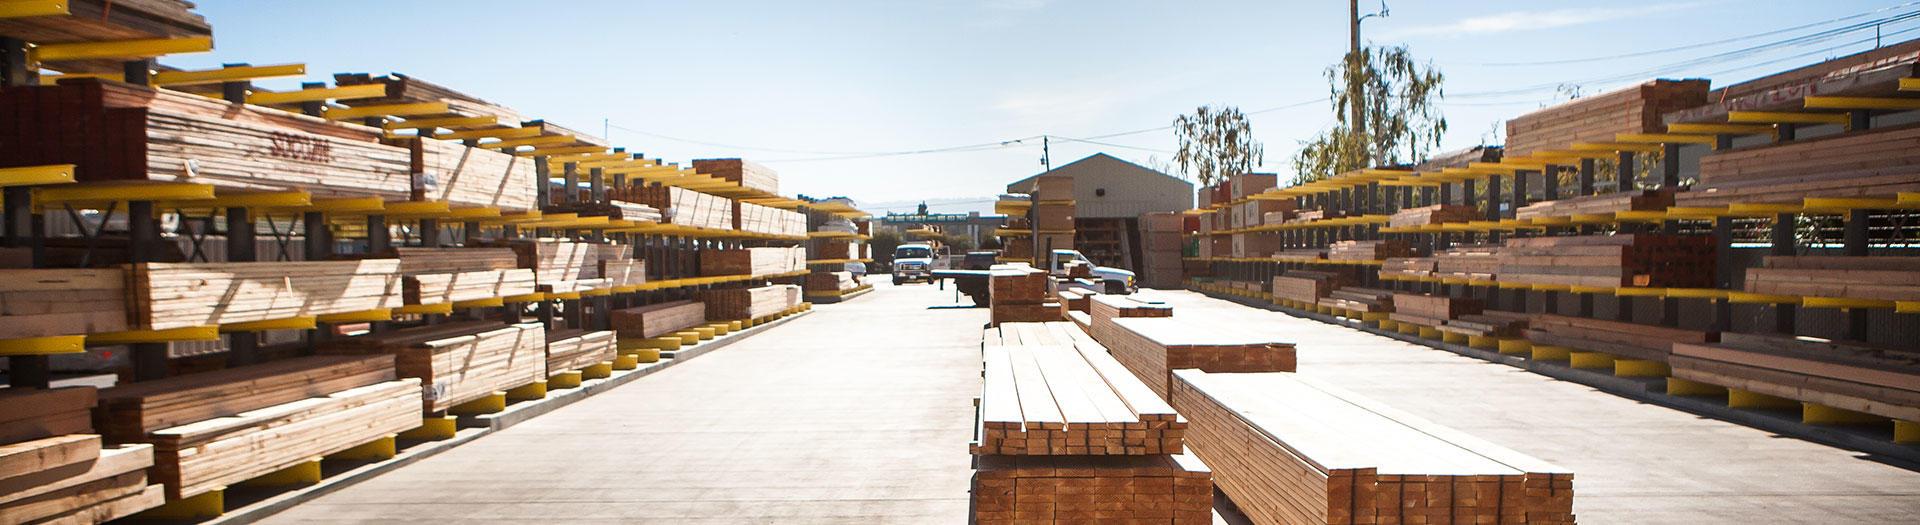 Hayward Lumber - Redwood City image 0